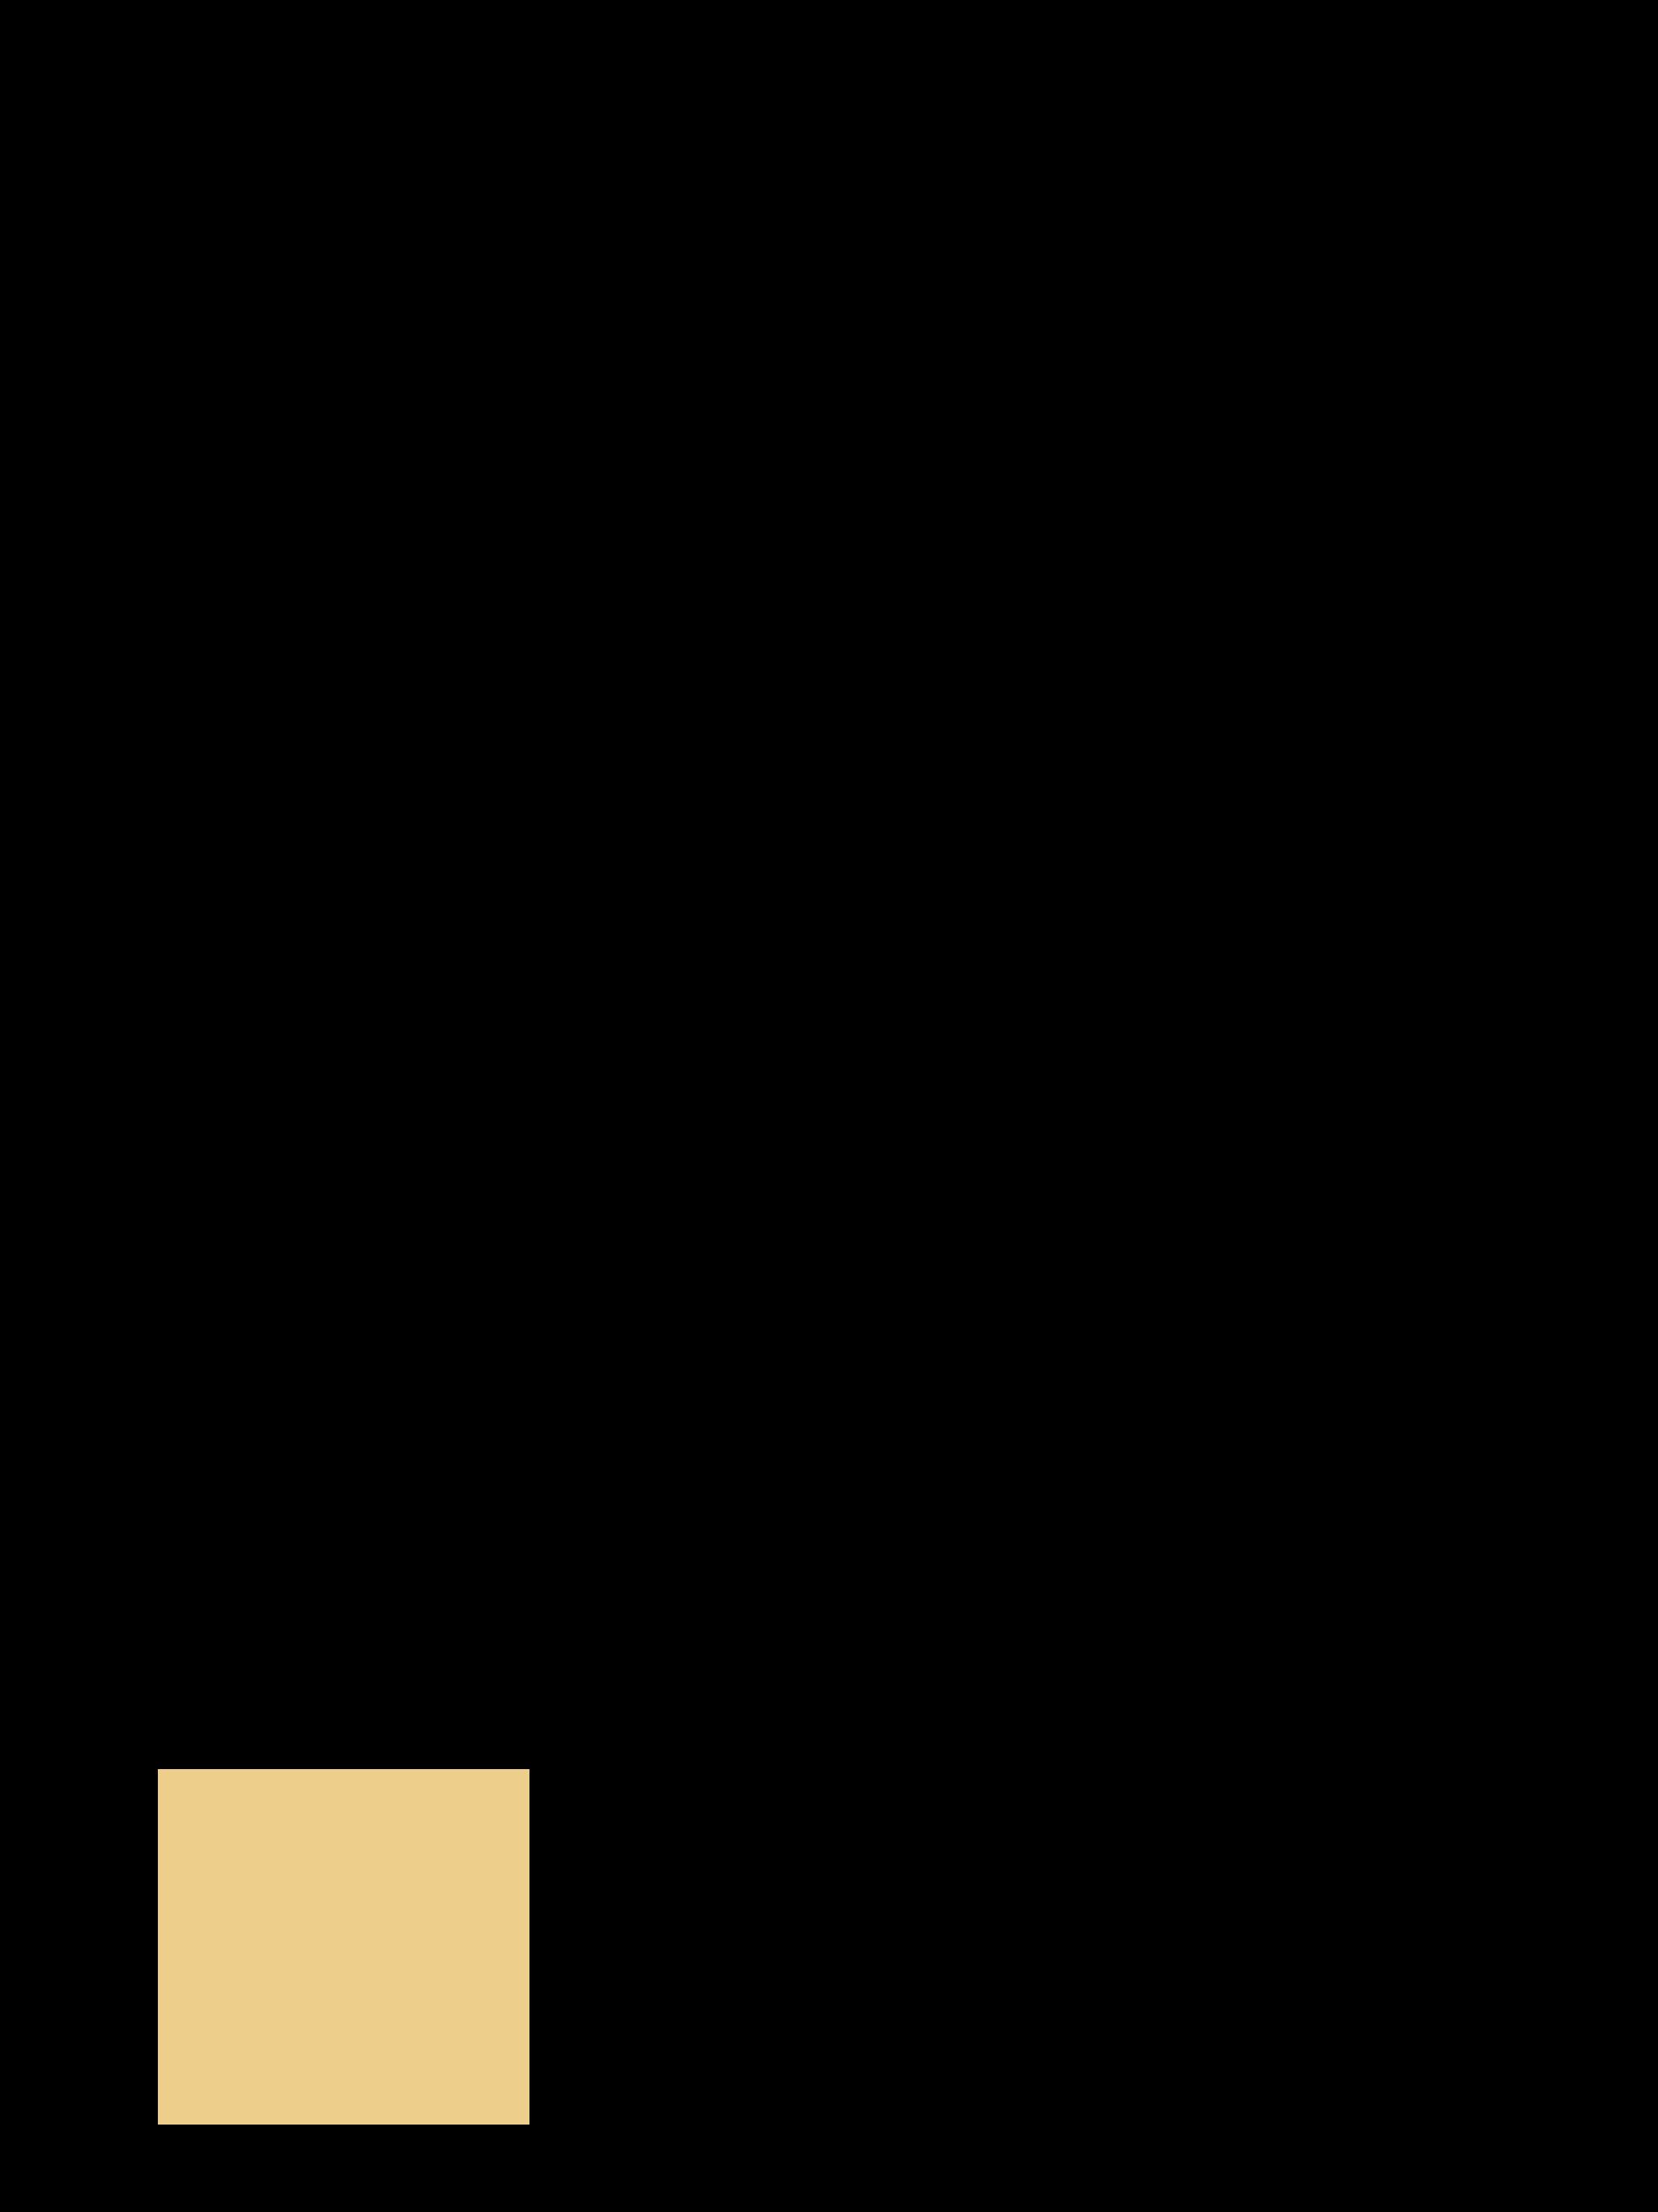 Ipad Vertical_2048x2732_Geo Heart_Gold.png